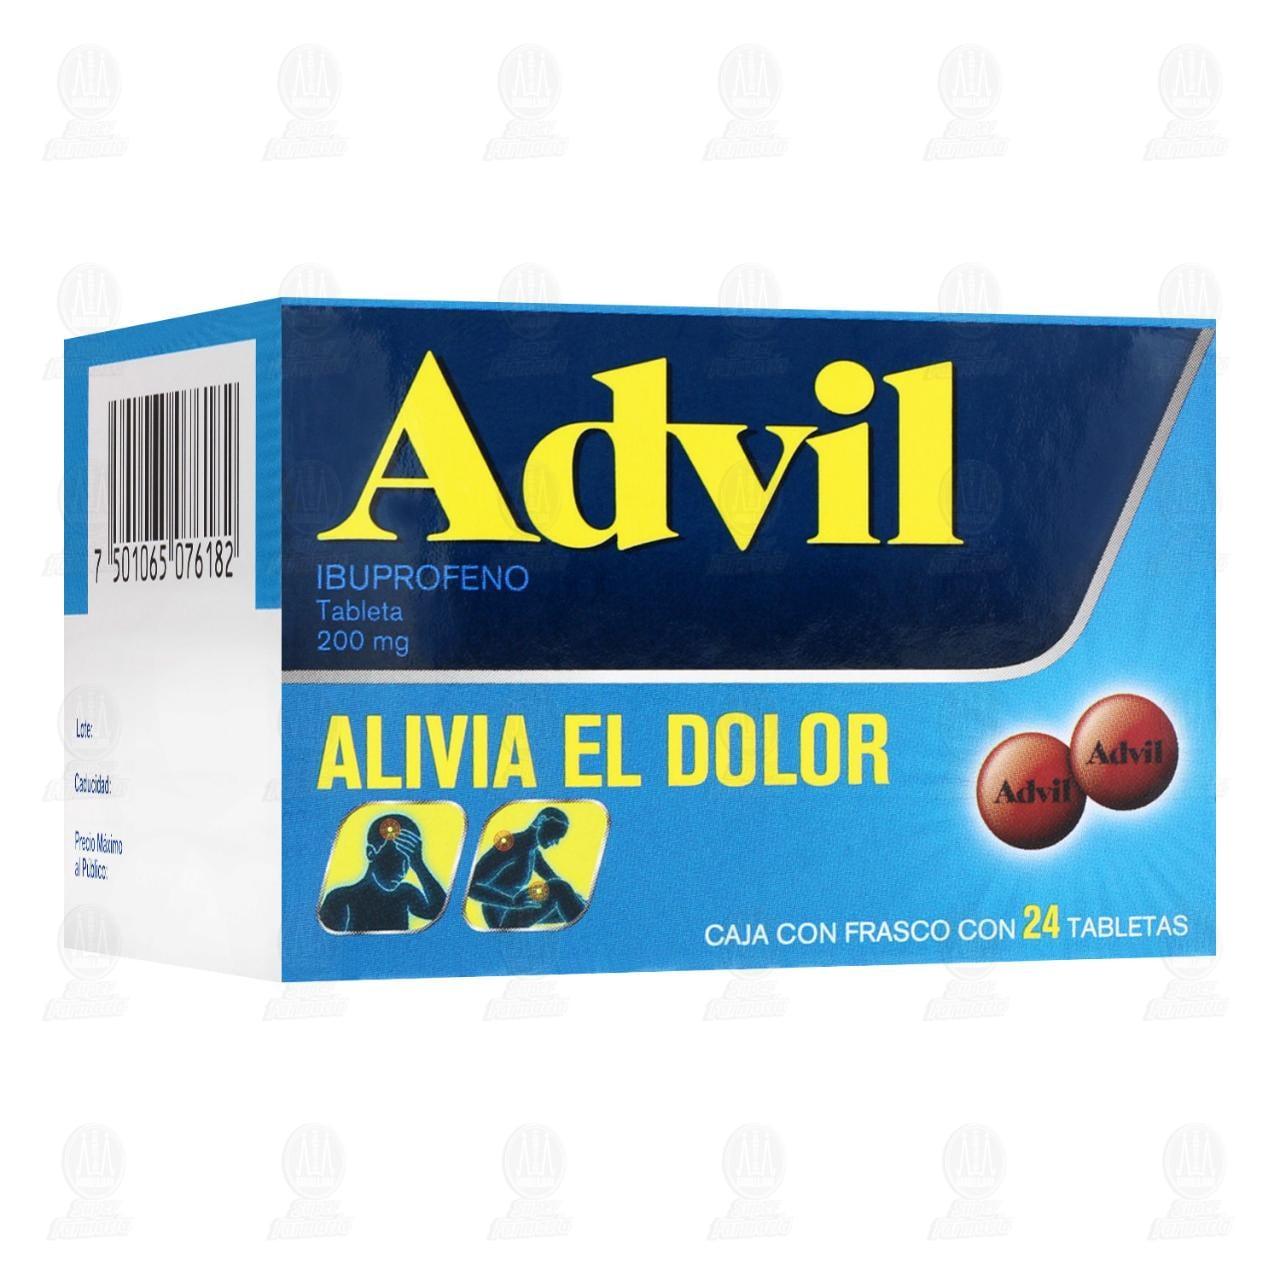 Comprar Advil 200mg 24 Tabletas en Farmacias Guadalajara